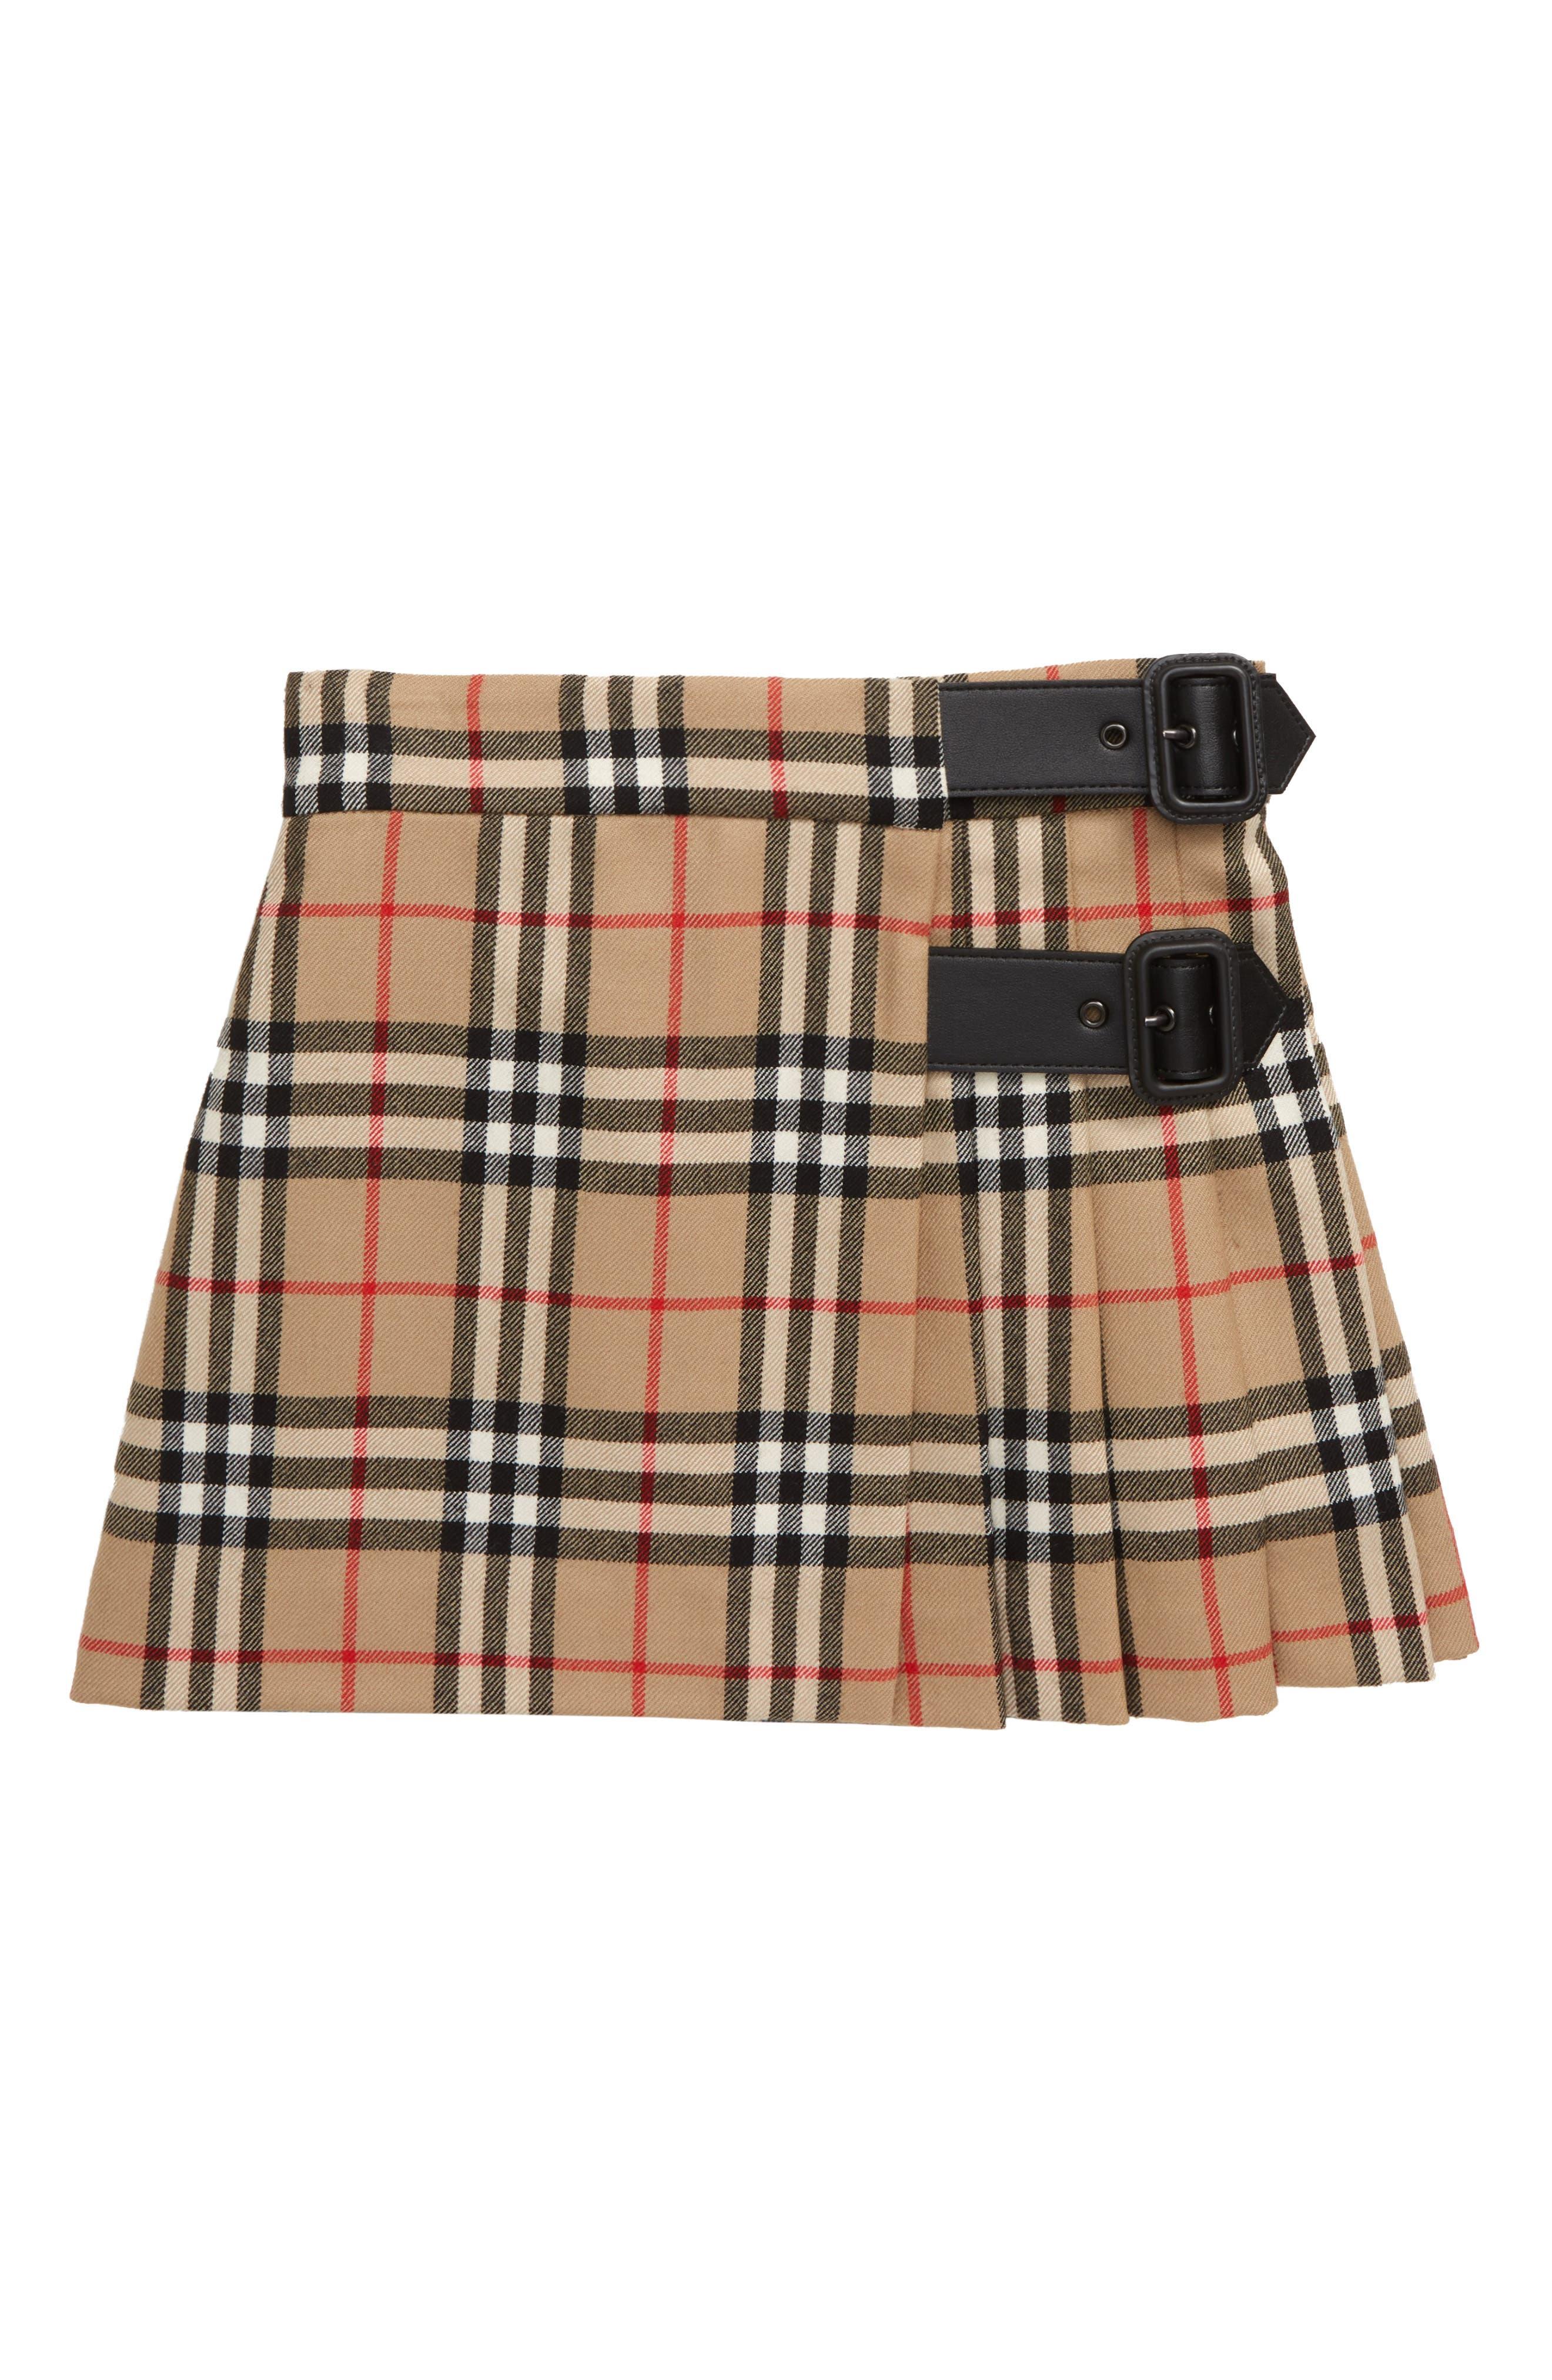 Fashion Plaid Skirt for 0-3 Years Toddler Newborn Kids Casual Skirt Short Dresses